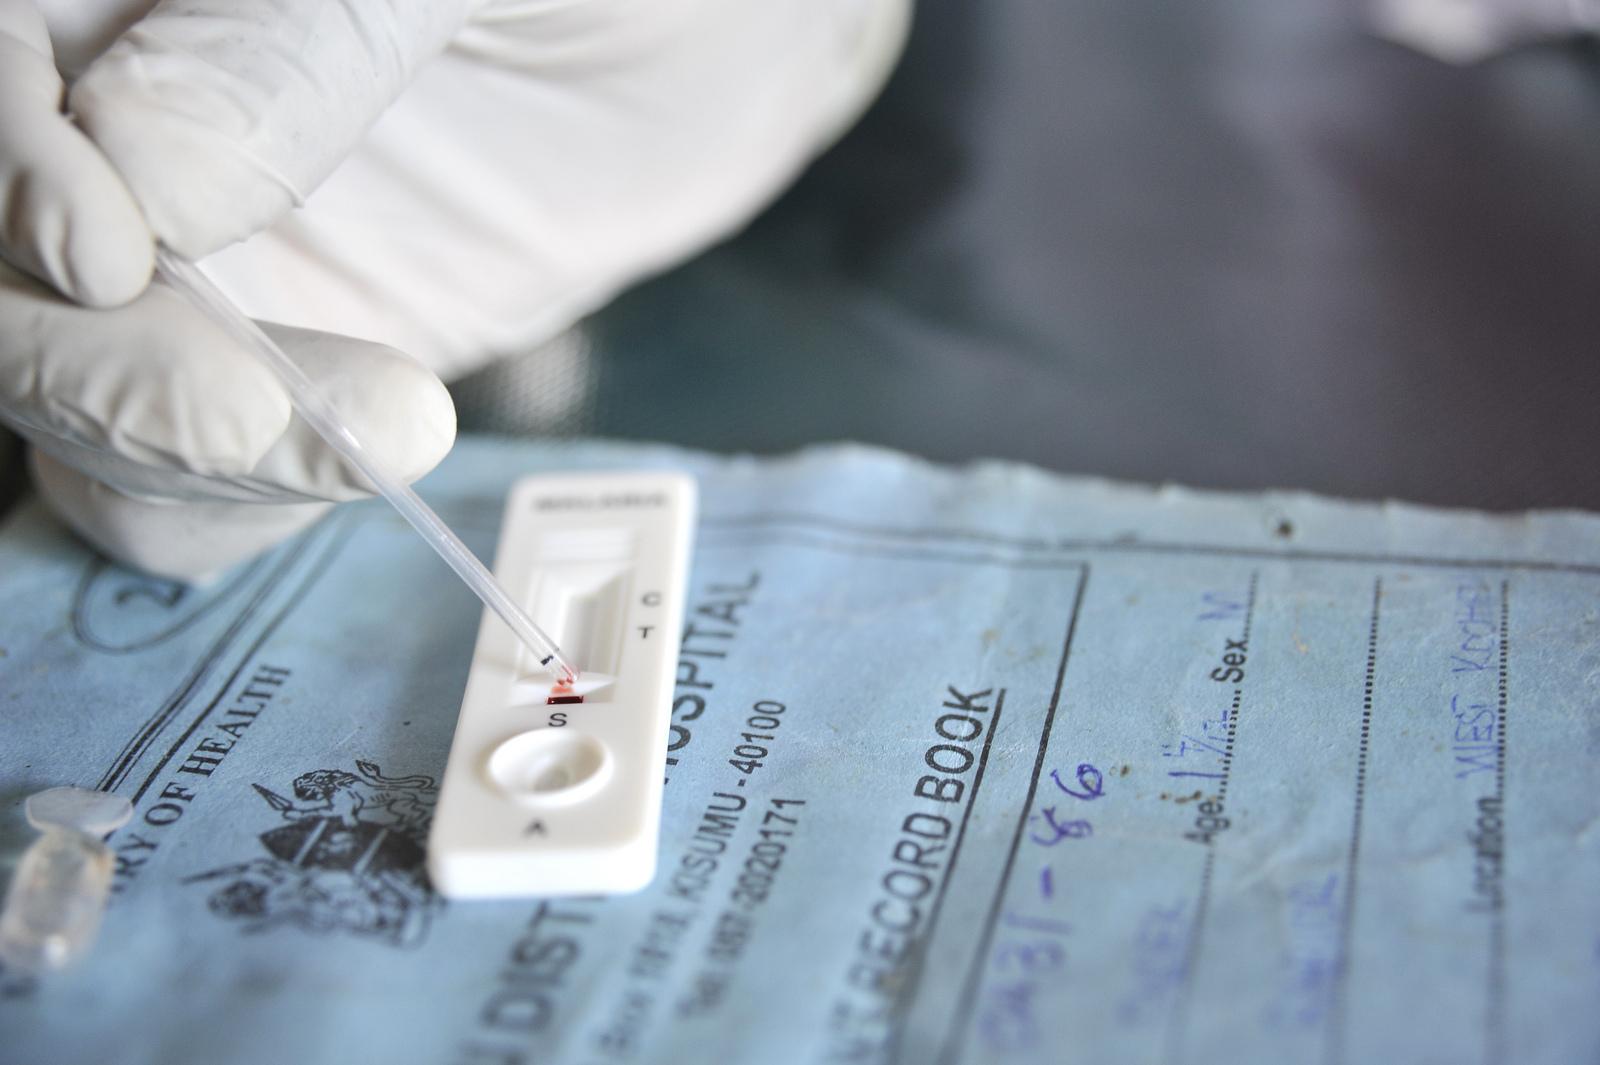 For a malaria-free world